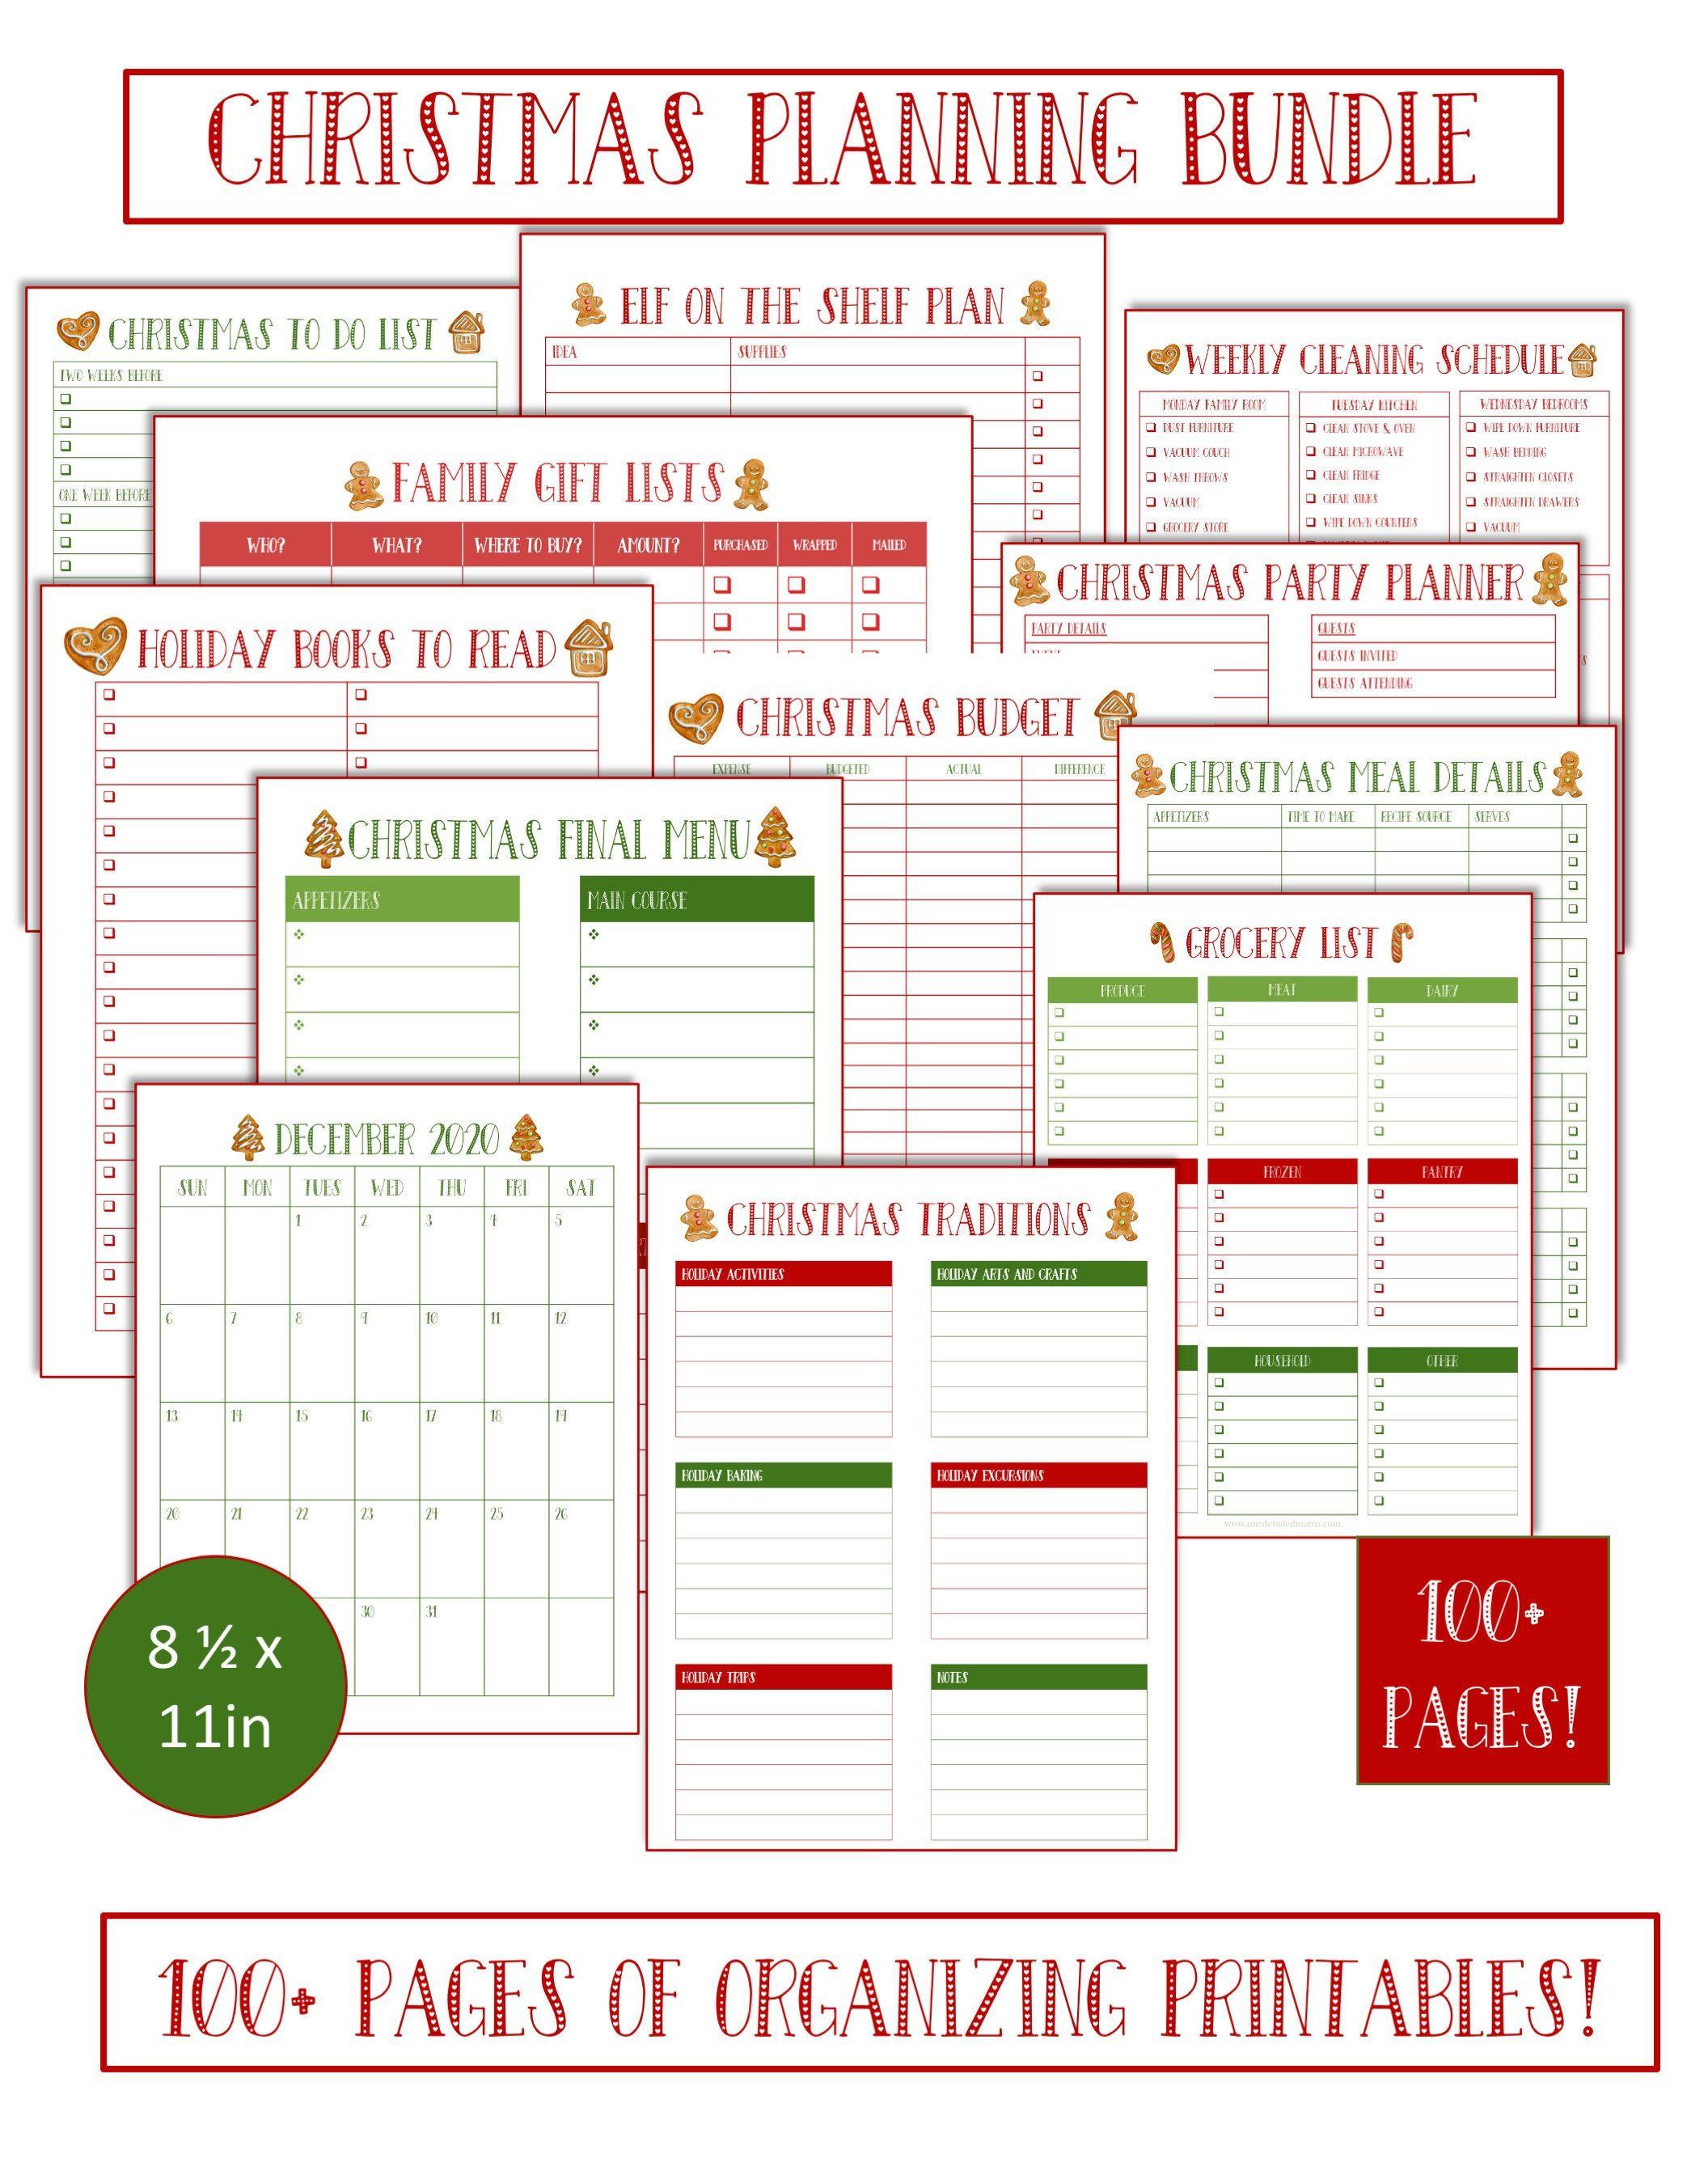 Christmas Planner Holiday Planner Christmas Gift List Planner Printable Christmas Menu Plan Holiday Budget Planner Xmas To Do Holiday Parties Workoutclothes